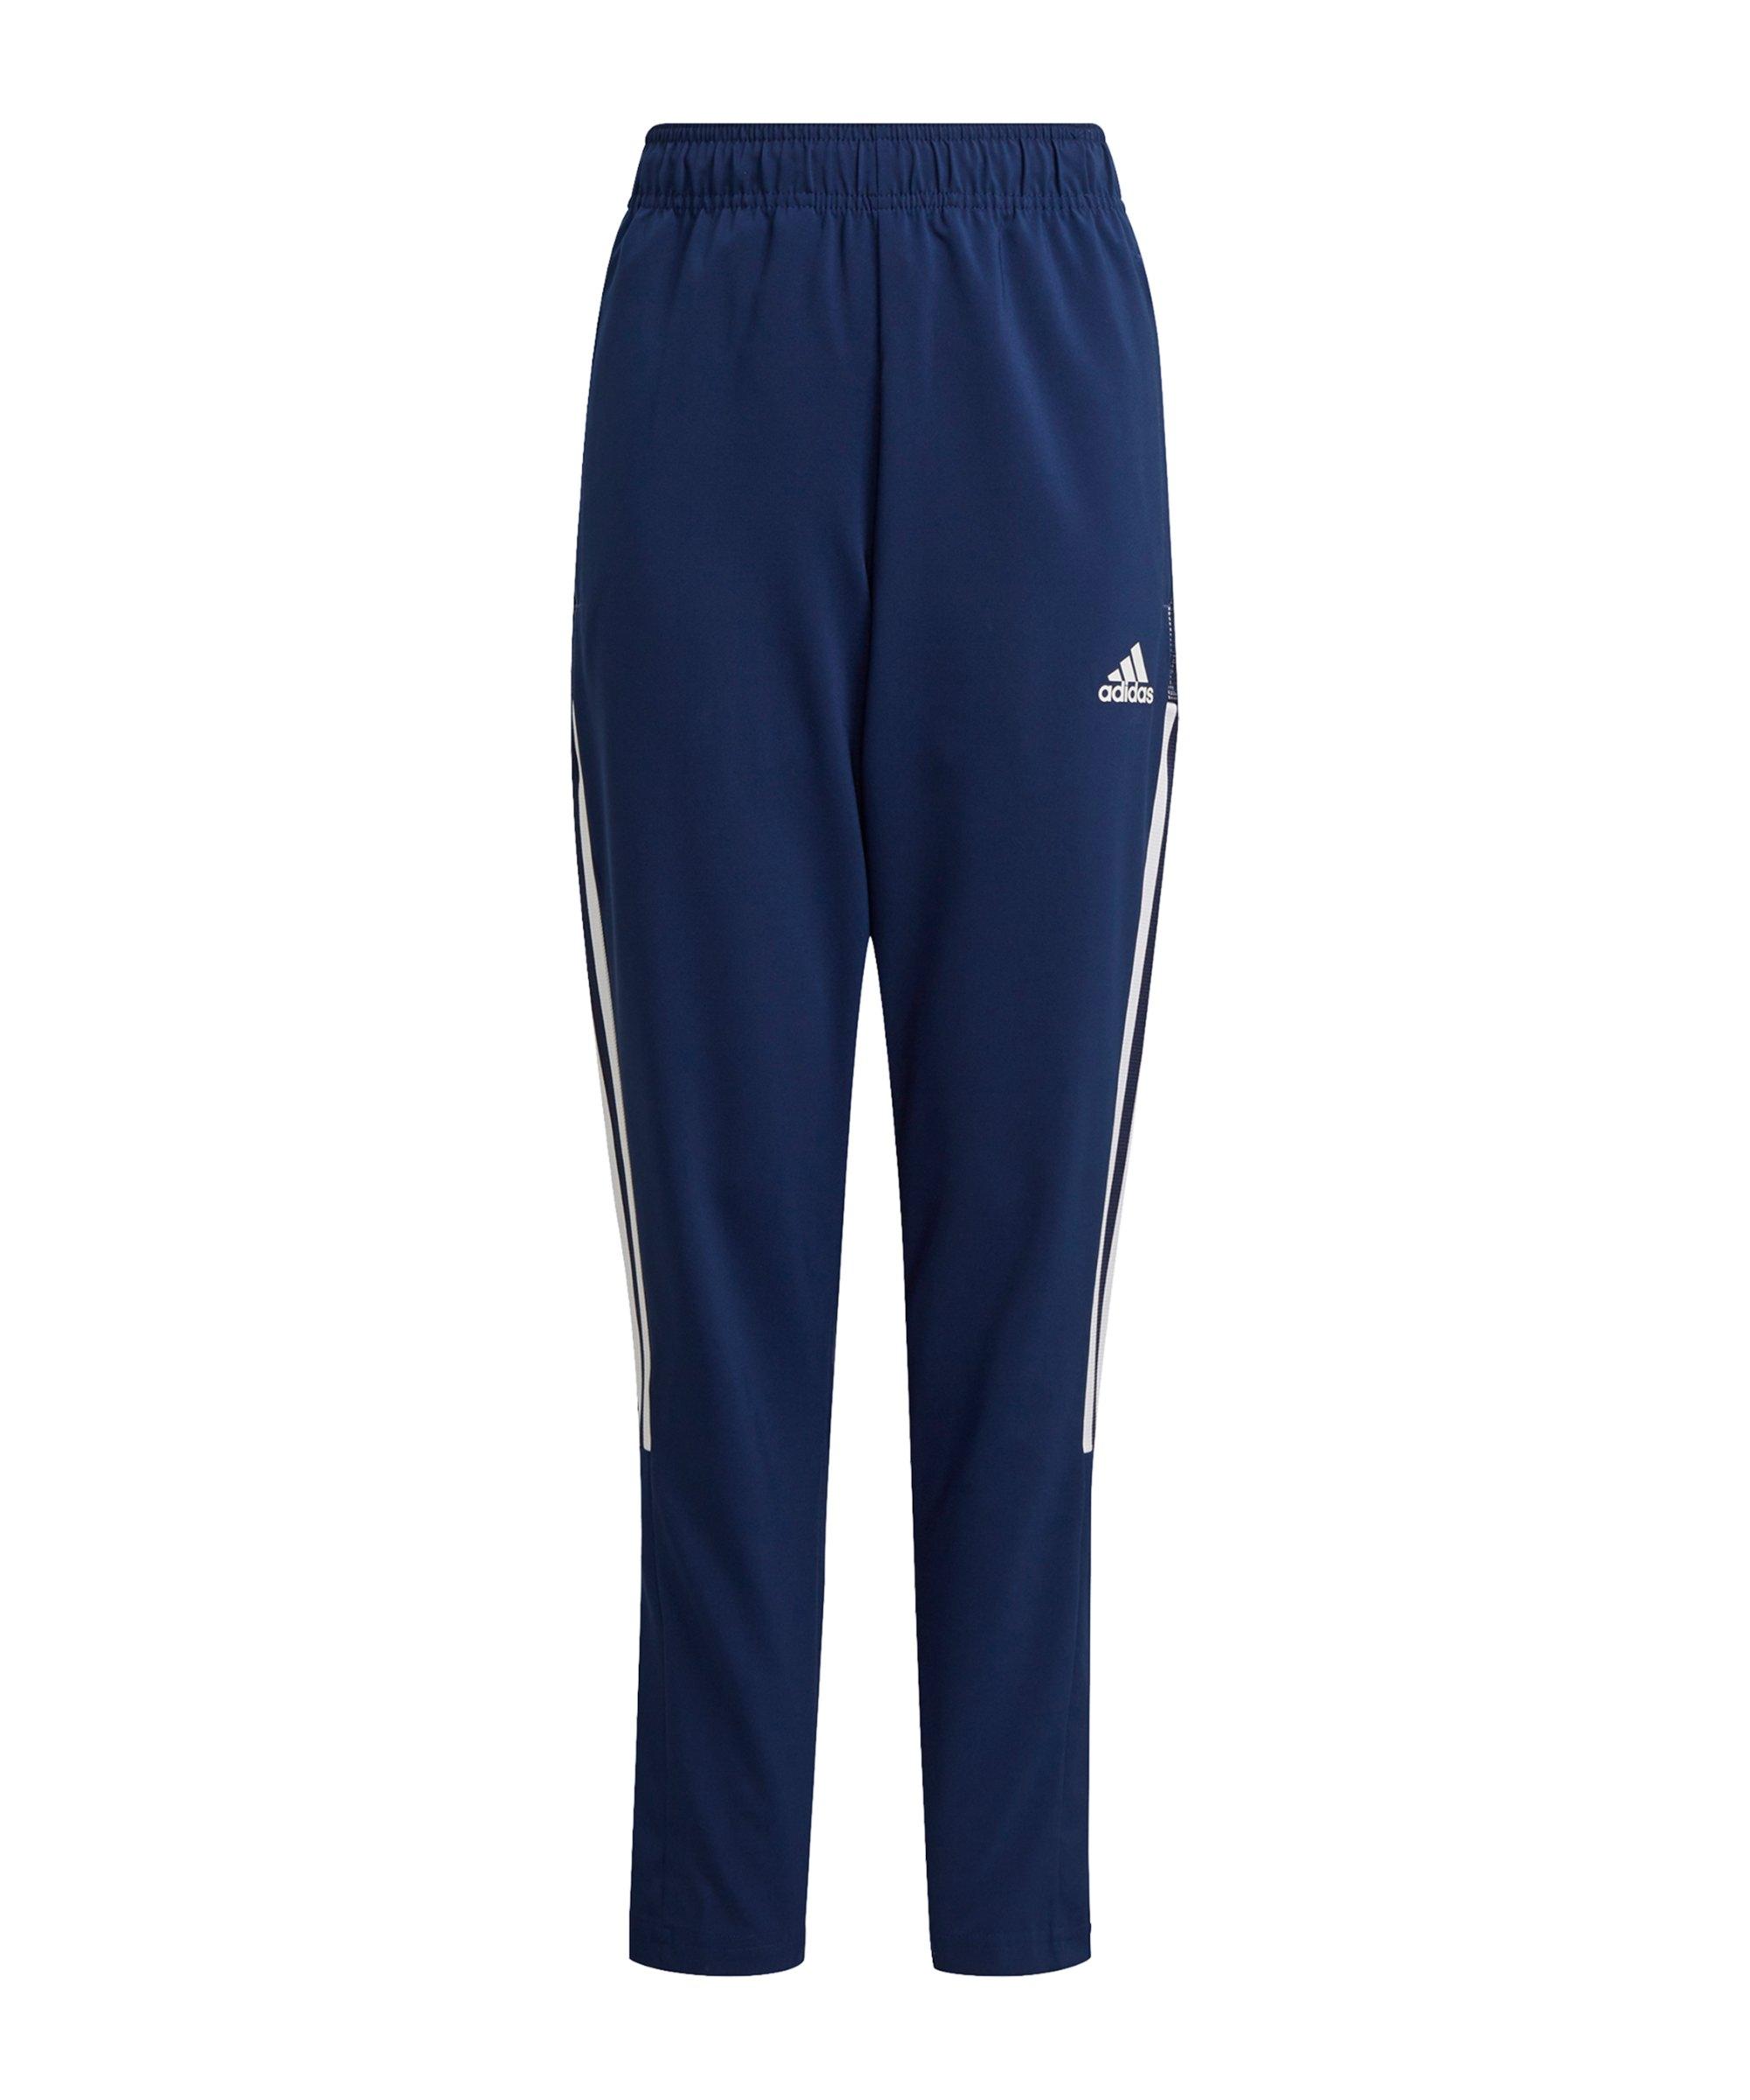 adidas Tiro 21 Woven Trainingshose Kids Dunkelblau - blau